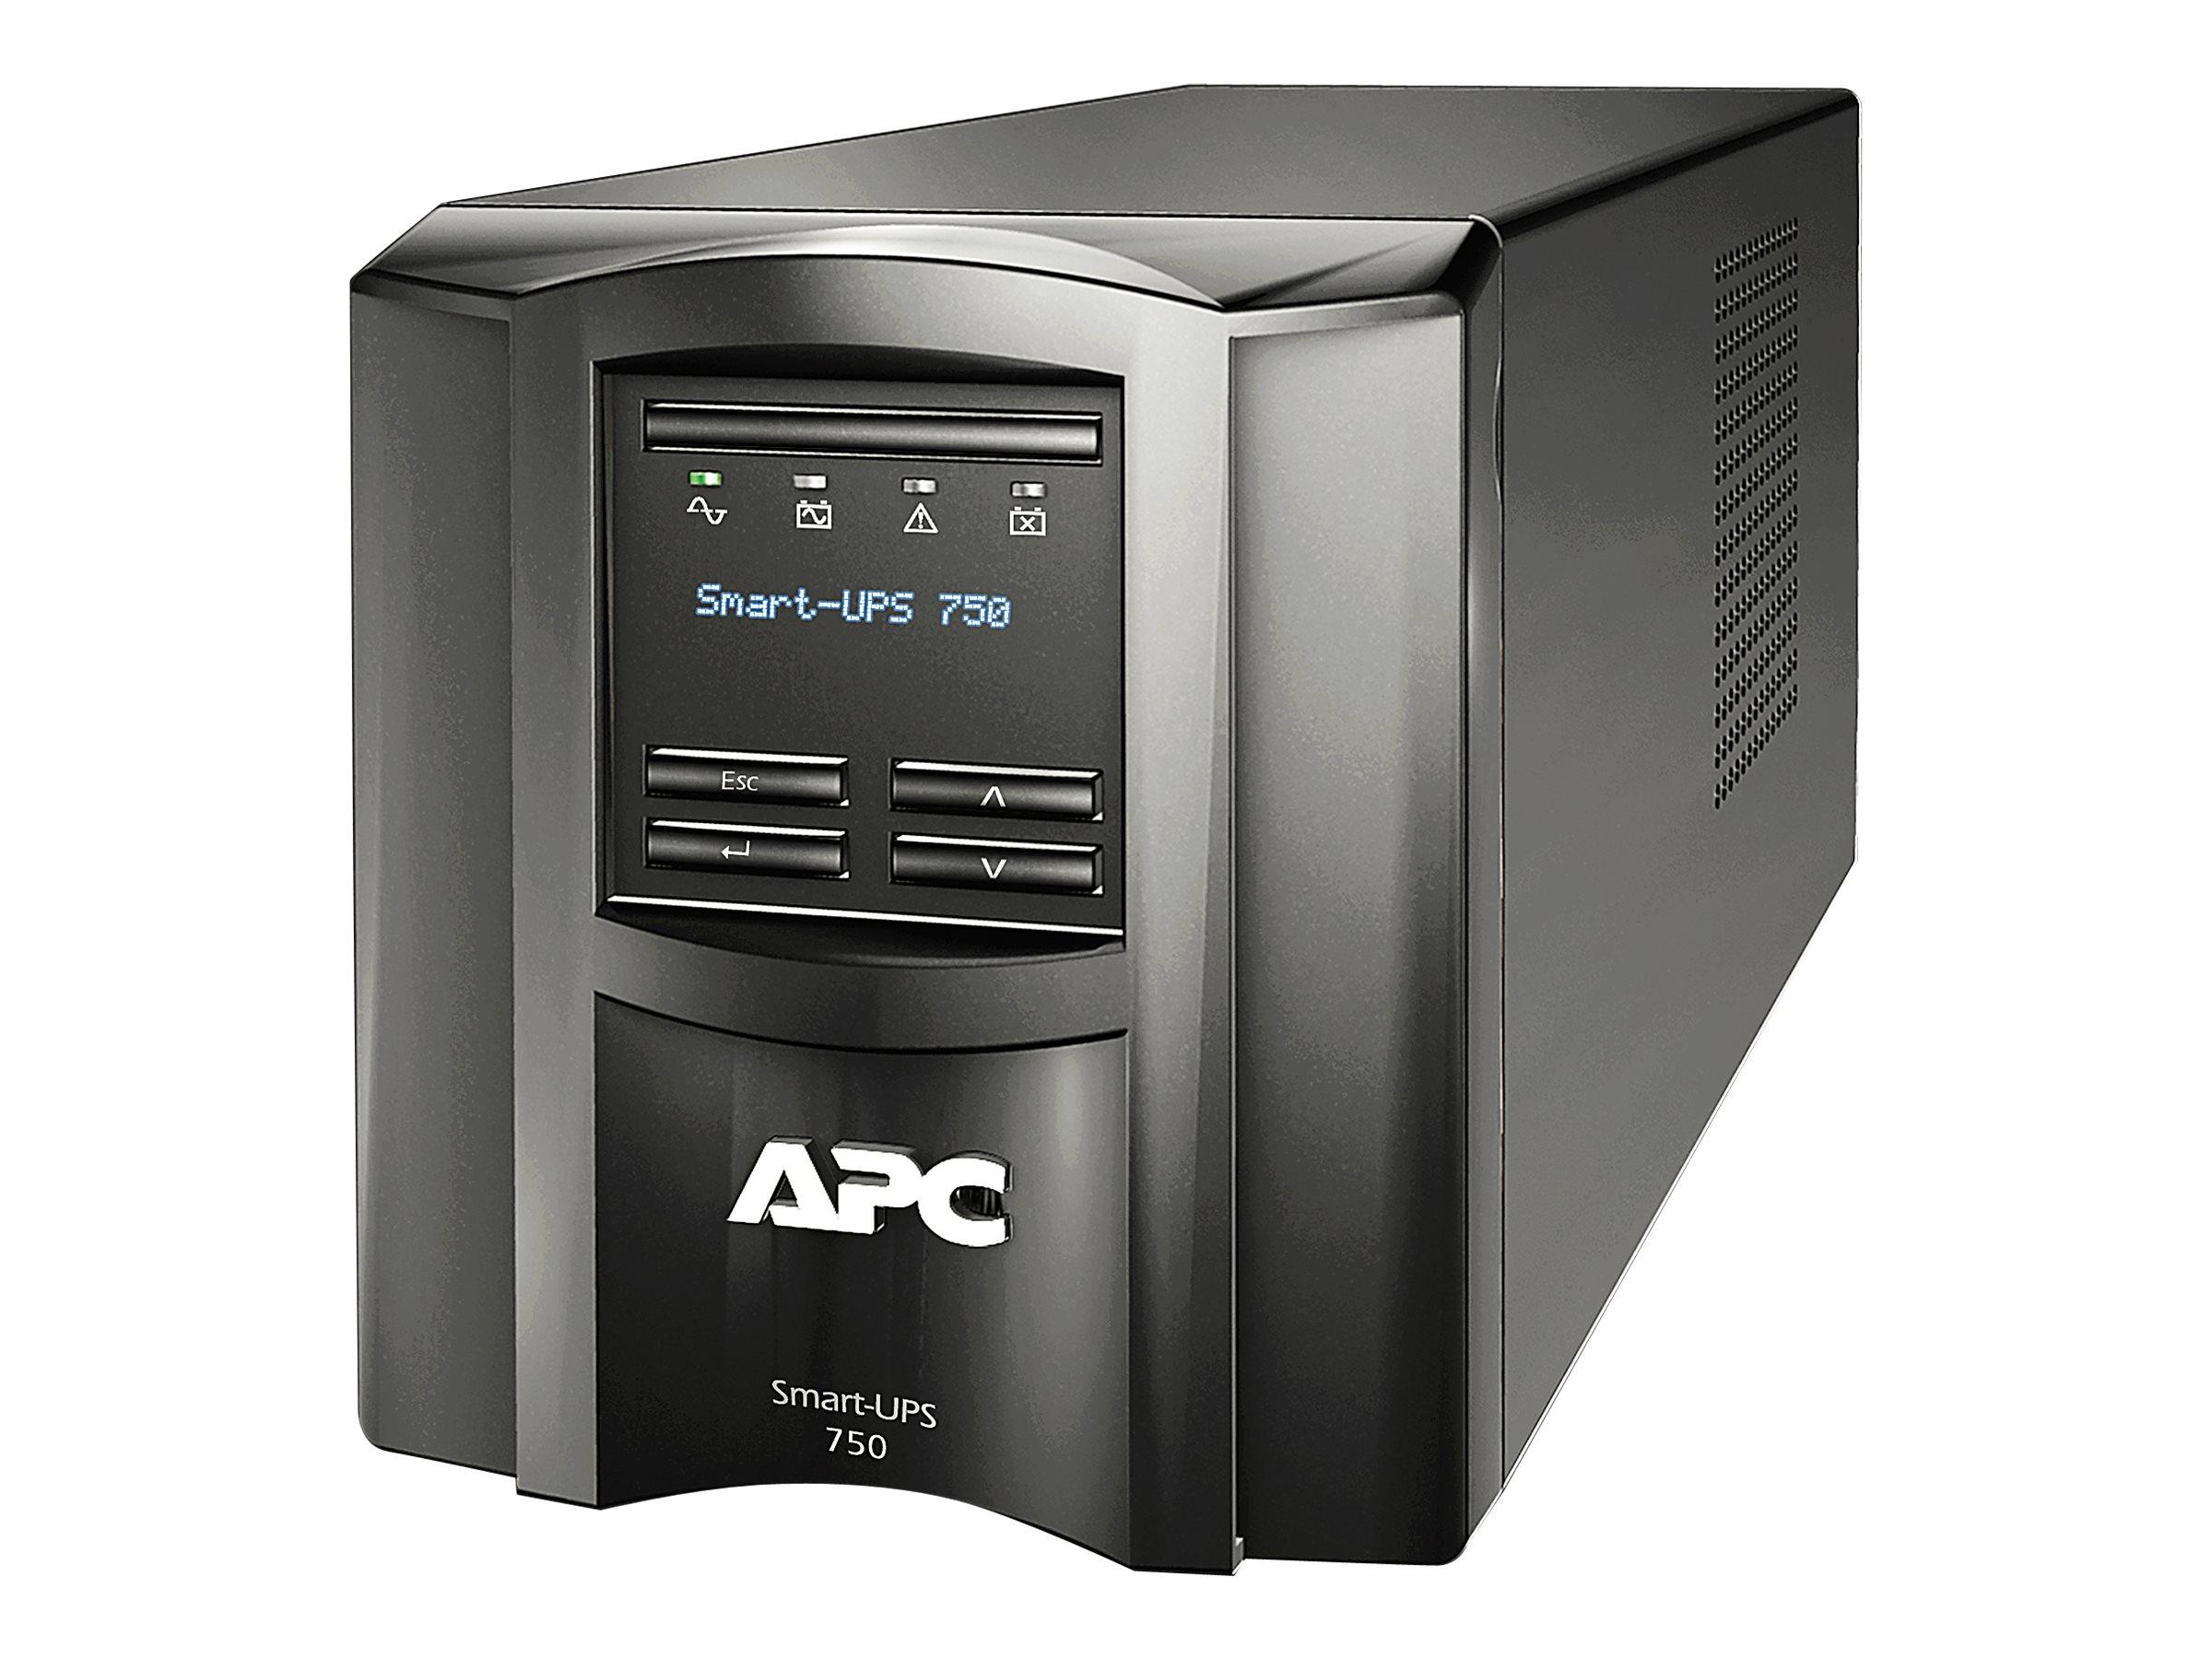 APC Smart-UPS 750 LCD - UPS - 500 Watt - 750 VA - not sold in CO, VT and WA